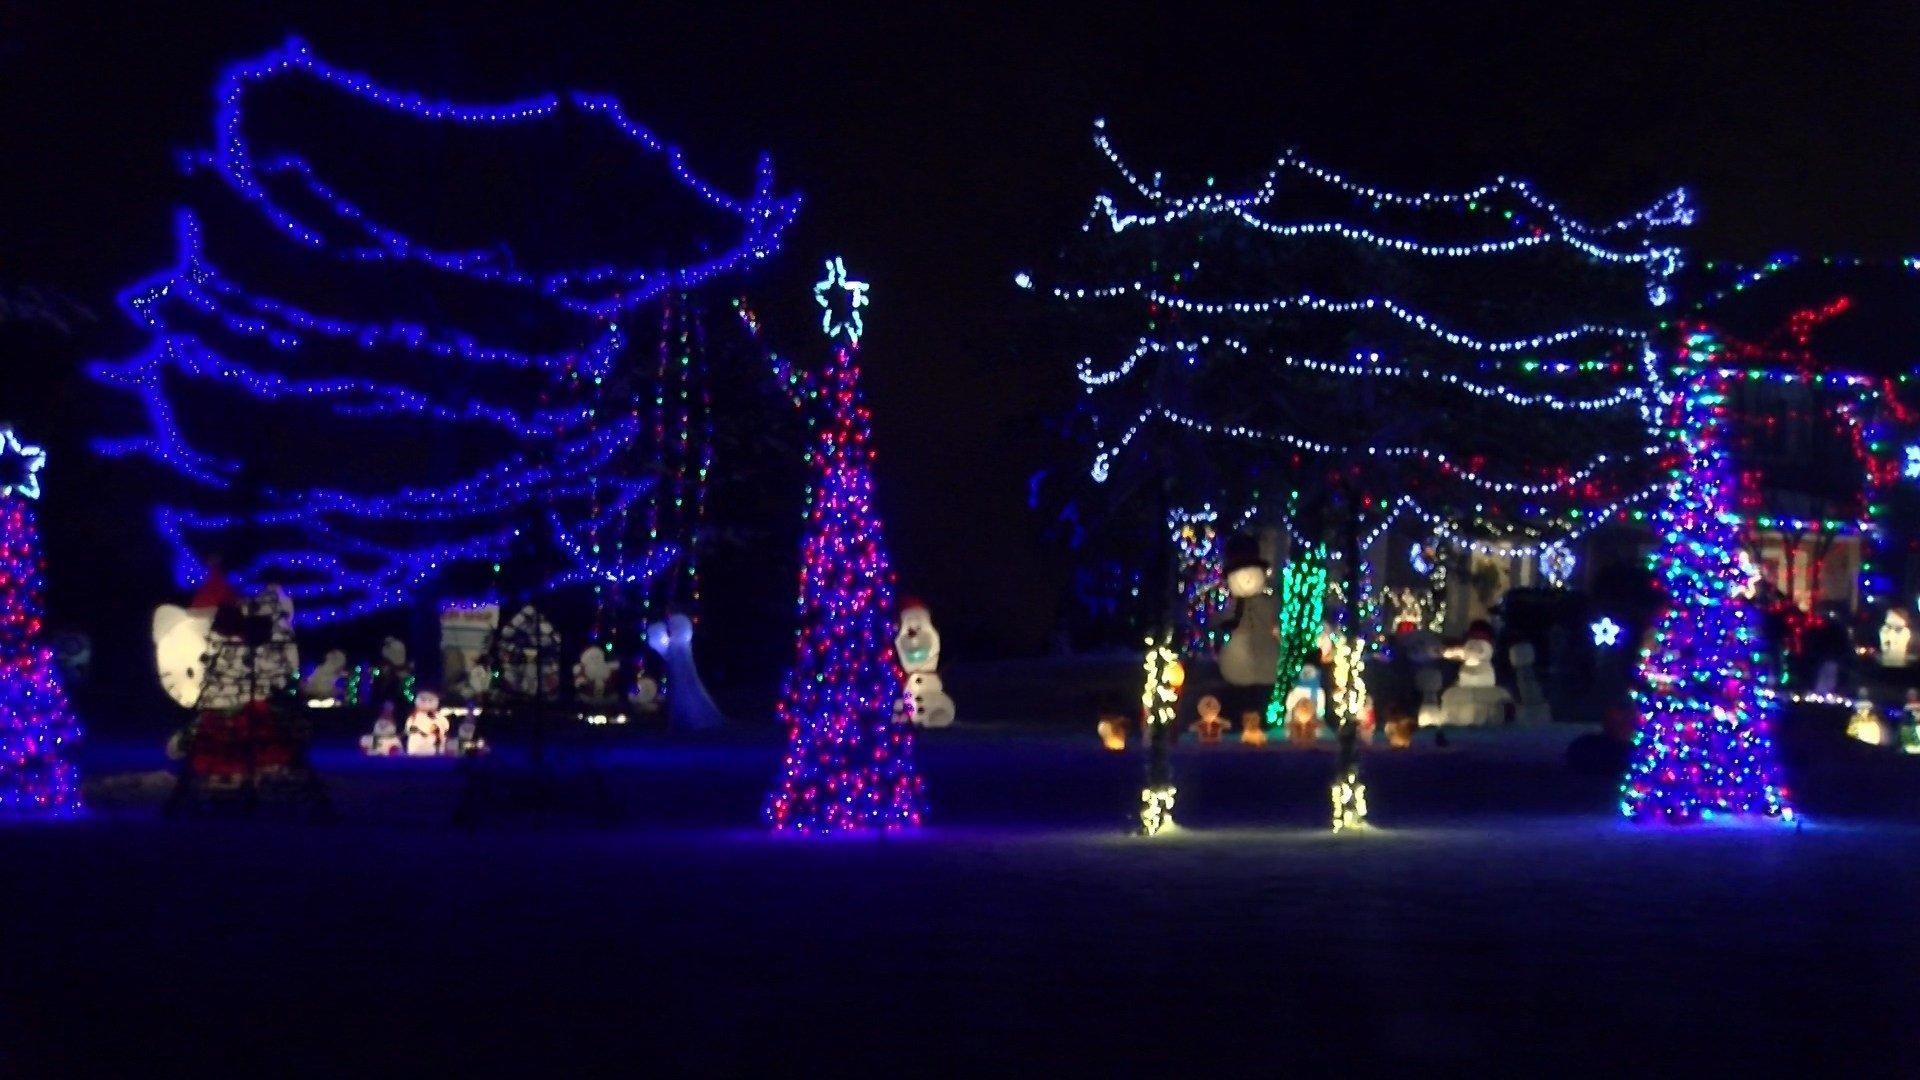 112th Lincoln Ne Christmas Lights 2019 Radio Station Holiday lights bring cheer to Lincoln   KLKN TV: News, Weather and